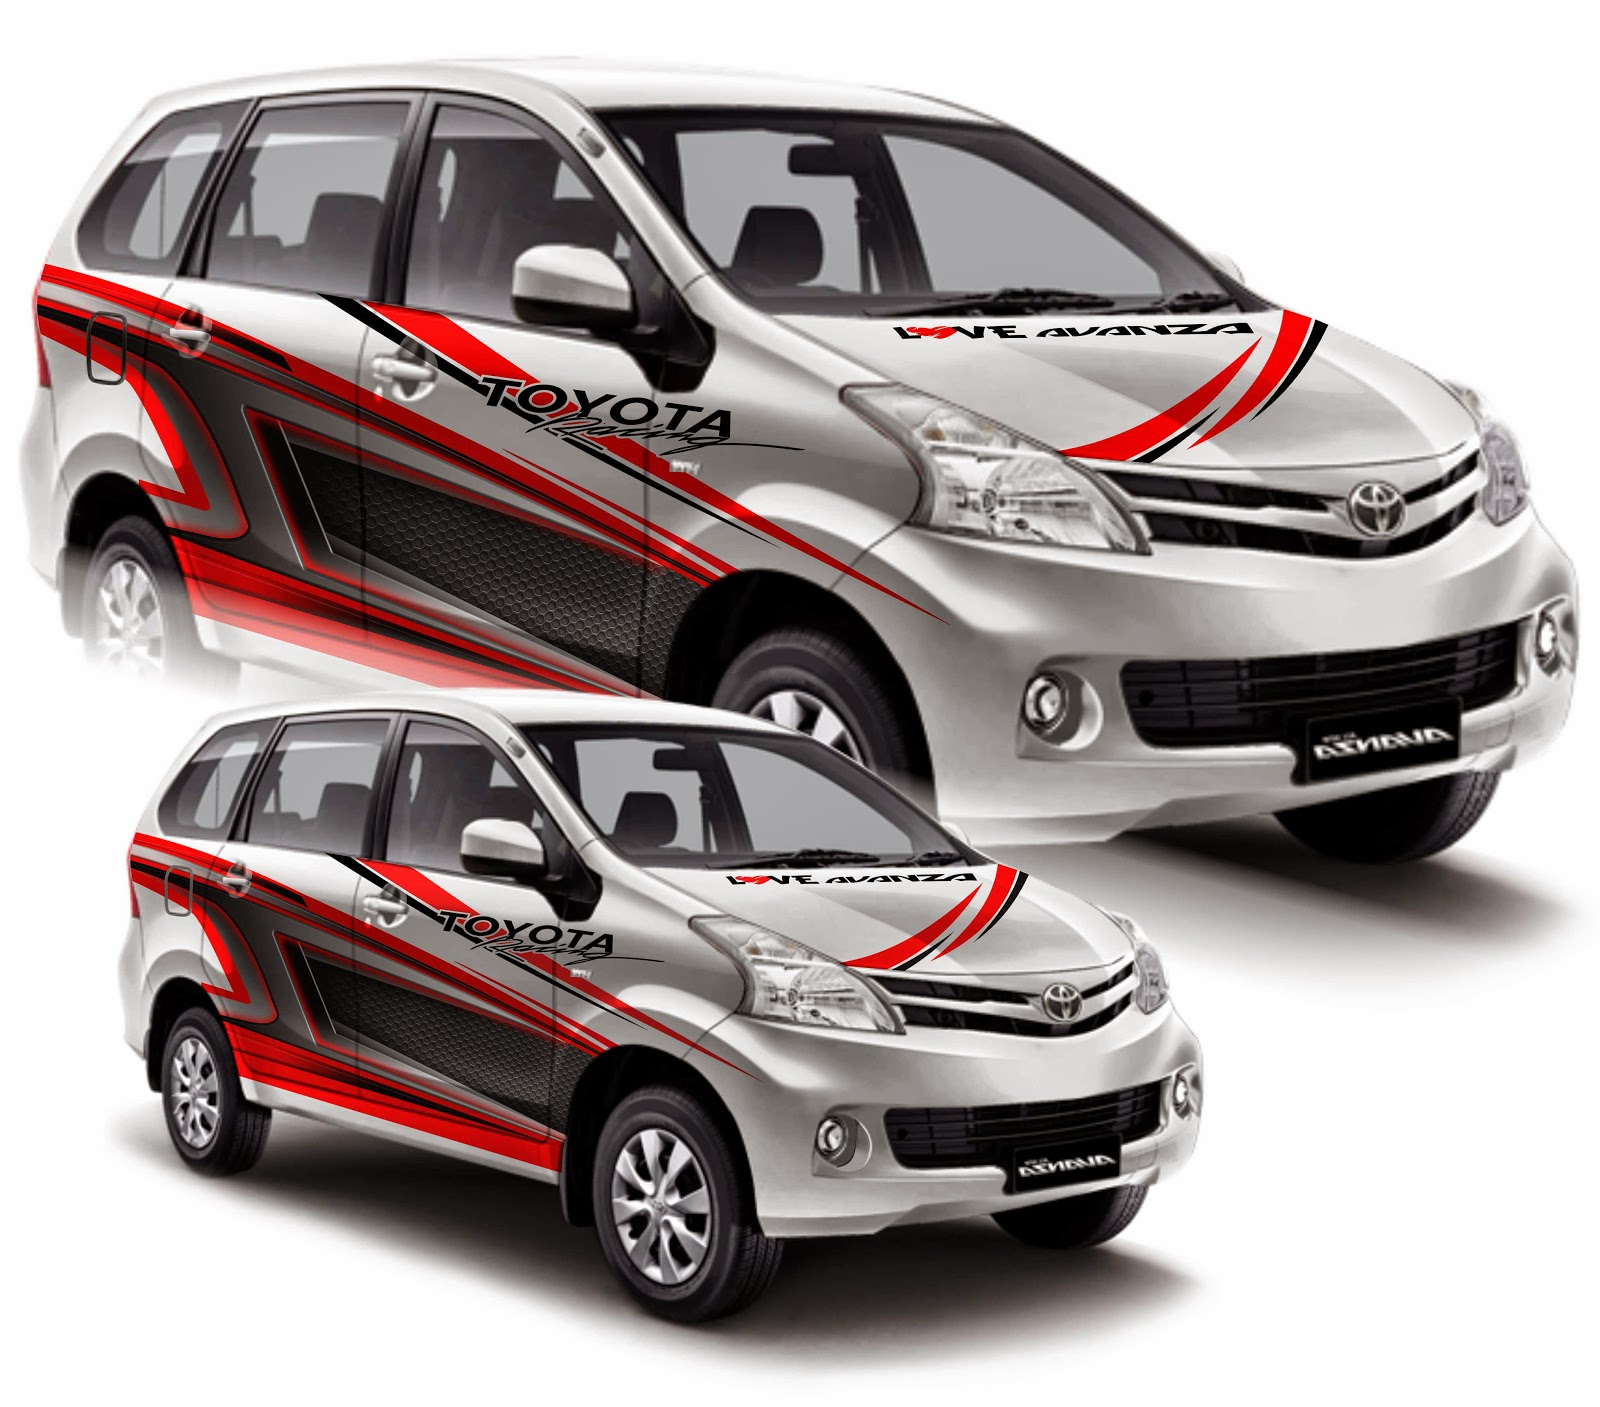 Cutting Sticker Grand New Avanza All Toyota Alphard 2018 Indonesia 98 Modifikasi Stiker Mobil Veloz Bekasi